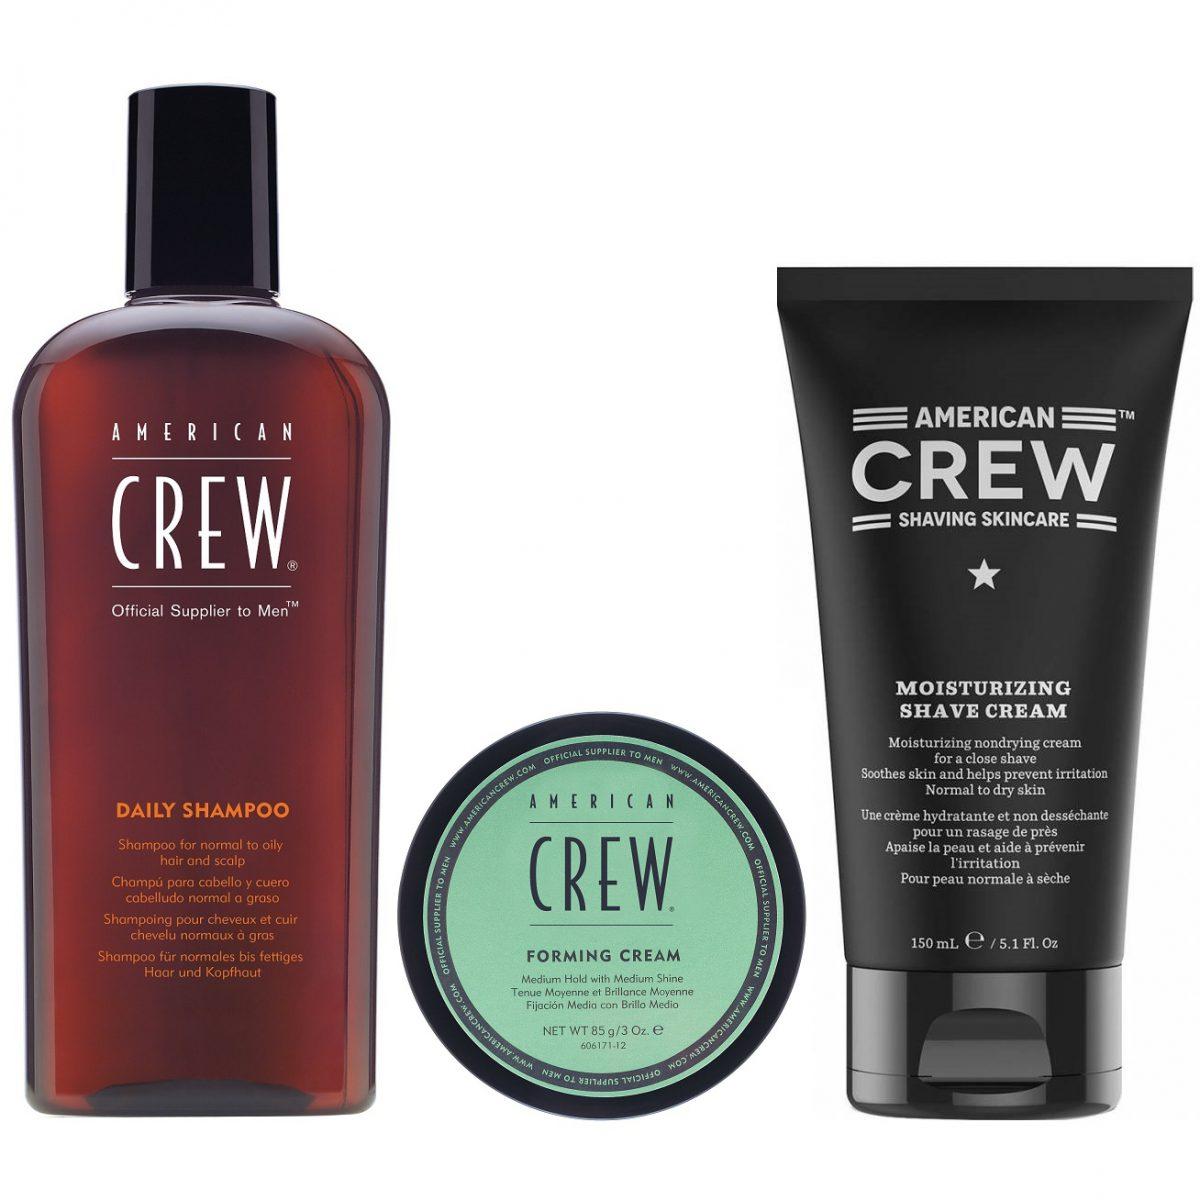 55_American-Crew-Daily-Shampoo-250ml_Forming_Cream_85gr_Moisturizing_Shave_Cream_150ml.jpg